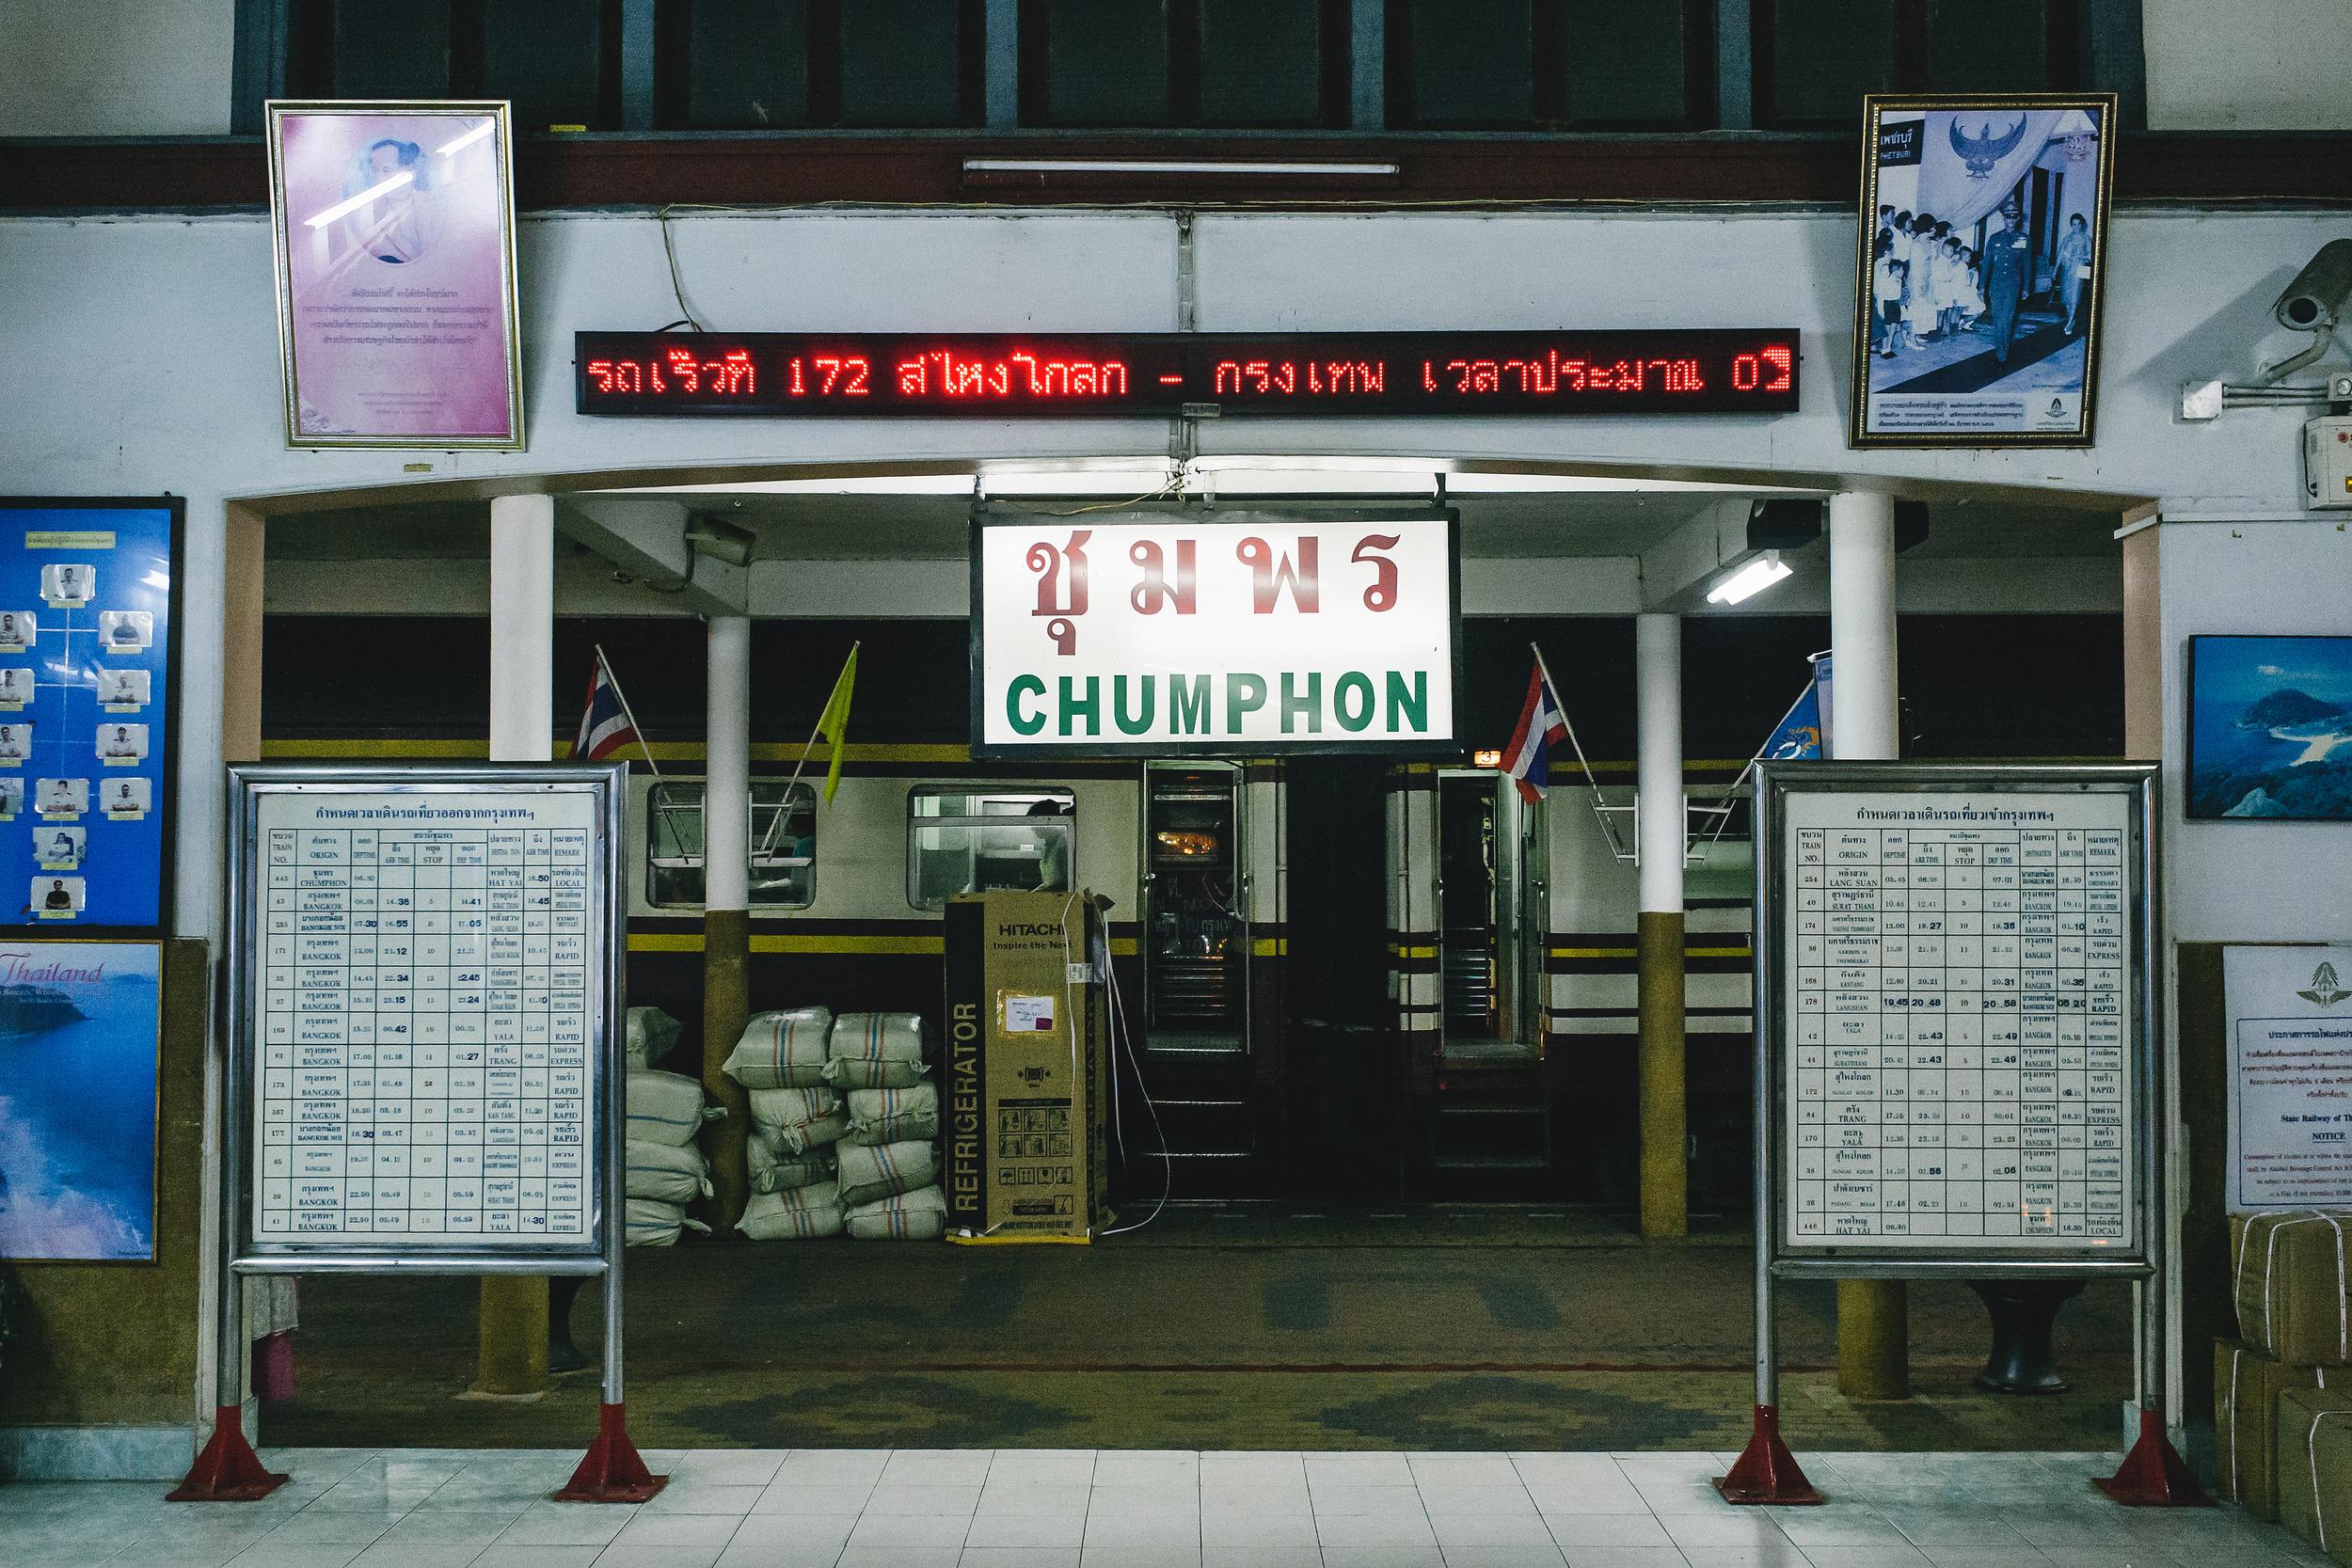 Arrival in Chumphon. Time: Zero Dark Thirty.